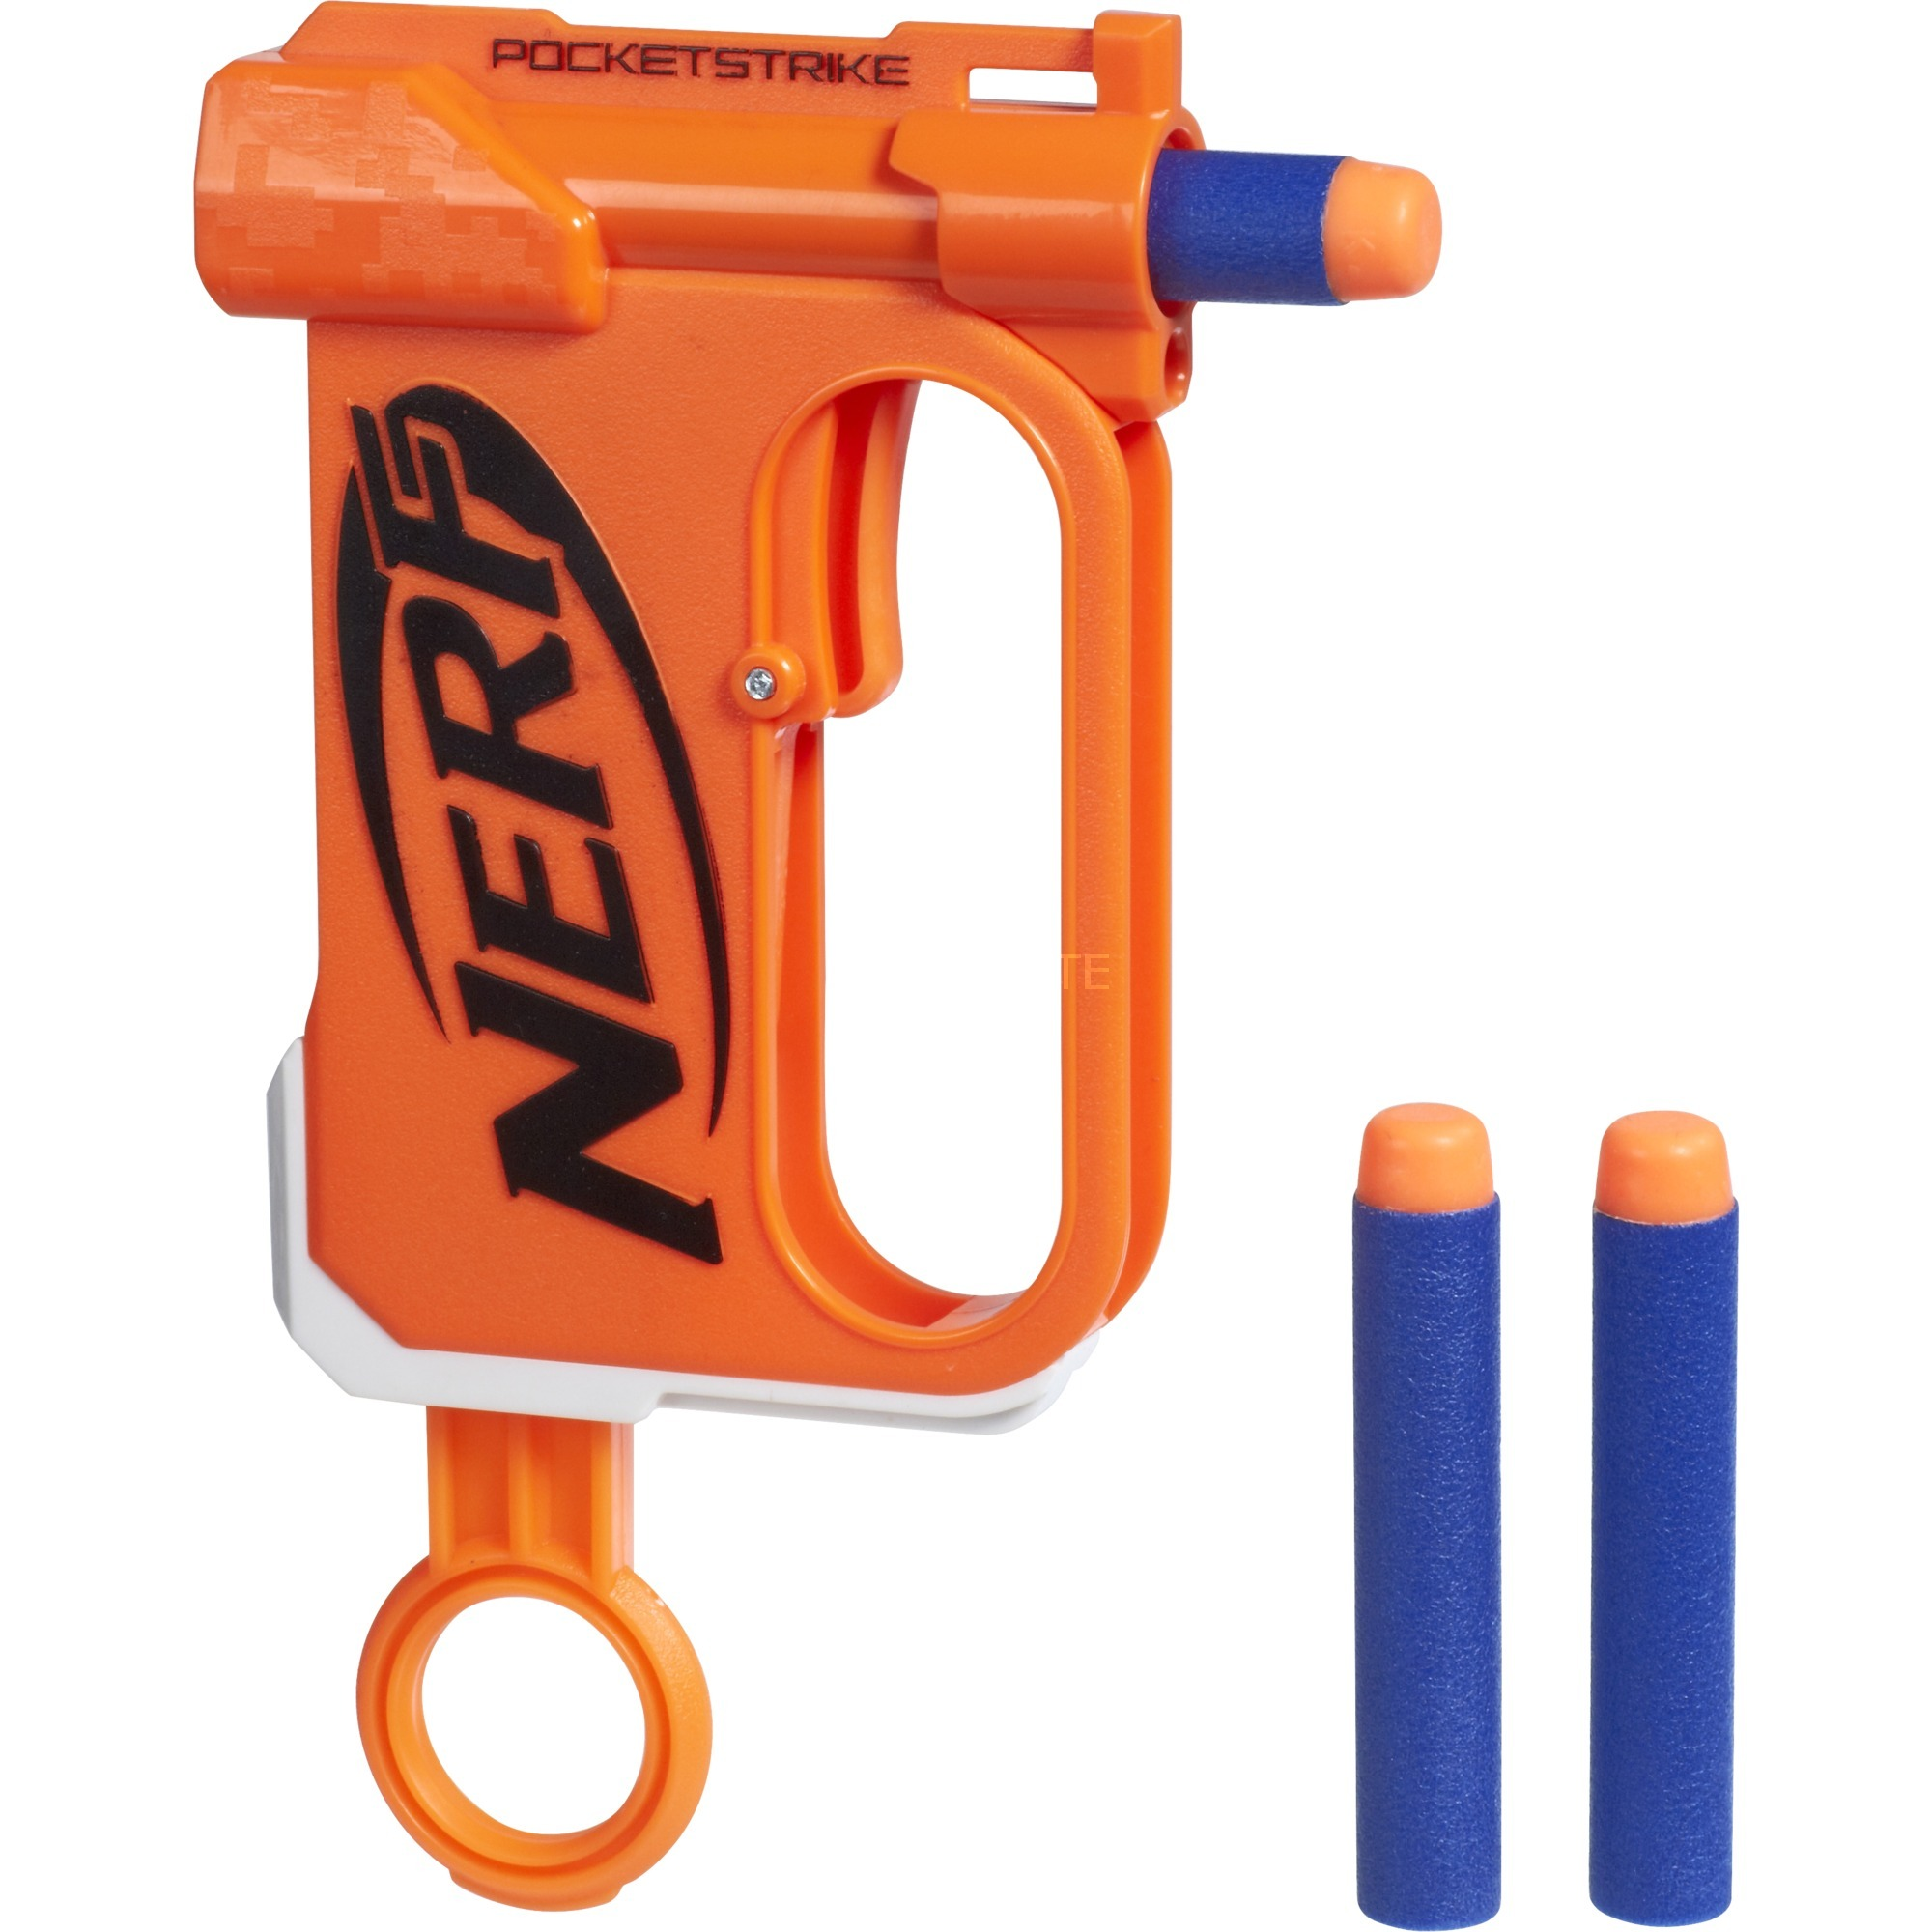 B6259 Pistola de juguete, Pistola Nerf